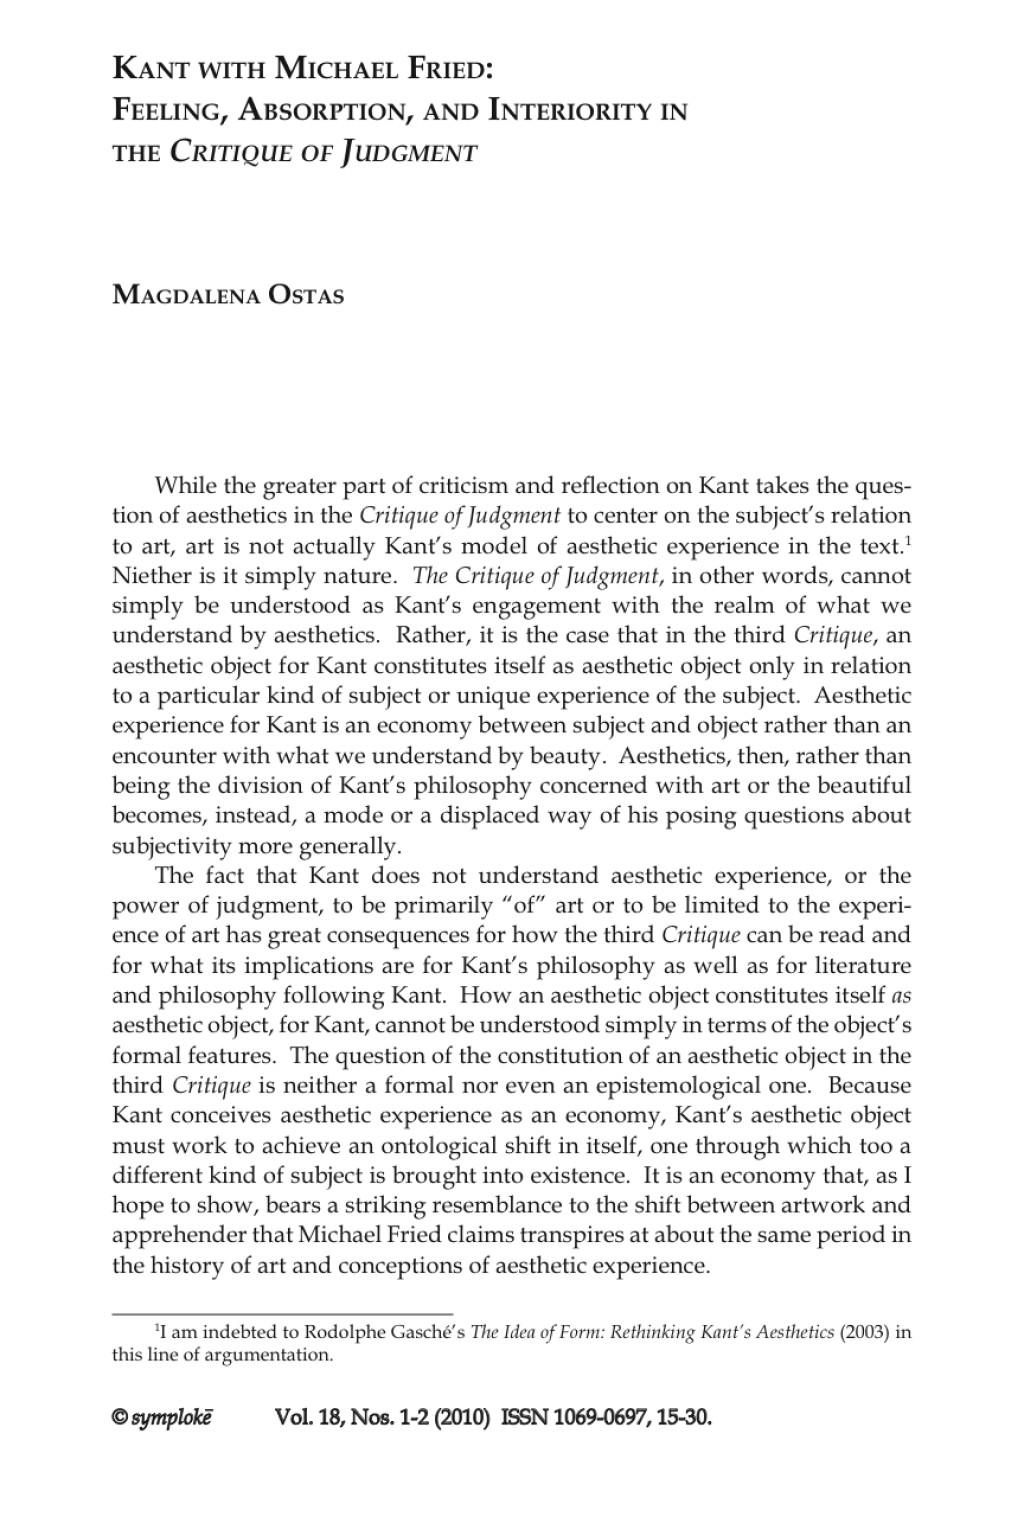 006 Essay Example Ostas Begin Frightening Dance Jazz Topics Scholarships Conclusion Large